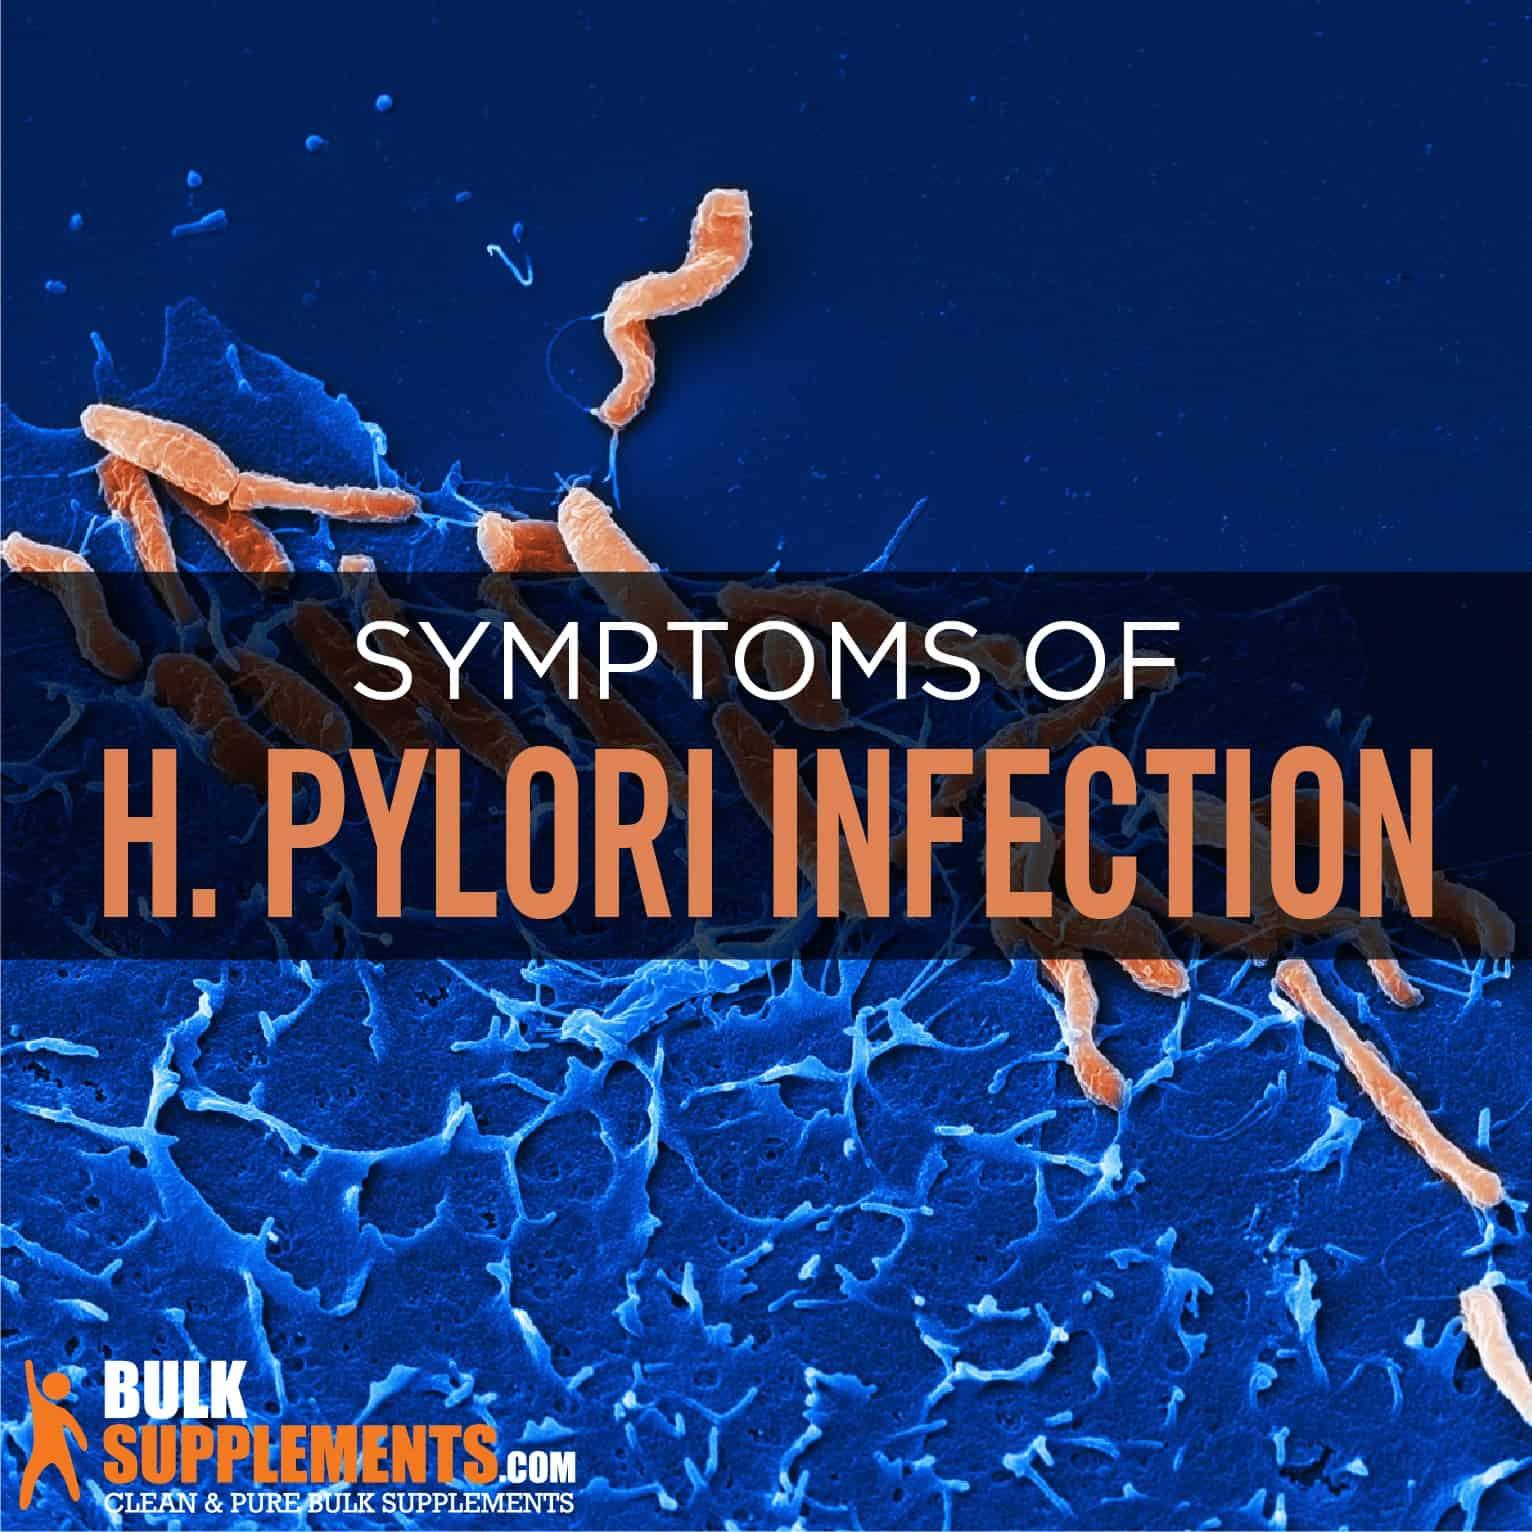 H. Pylori Infection